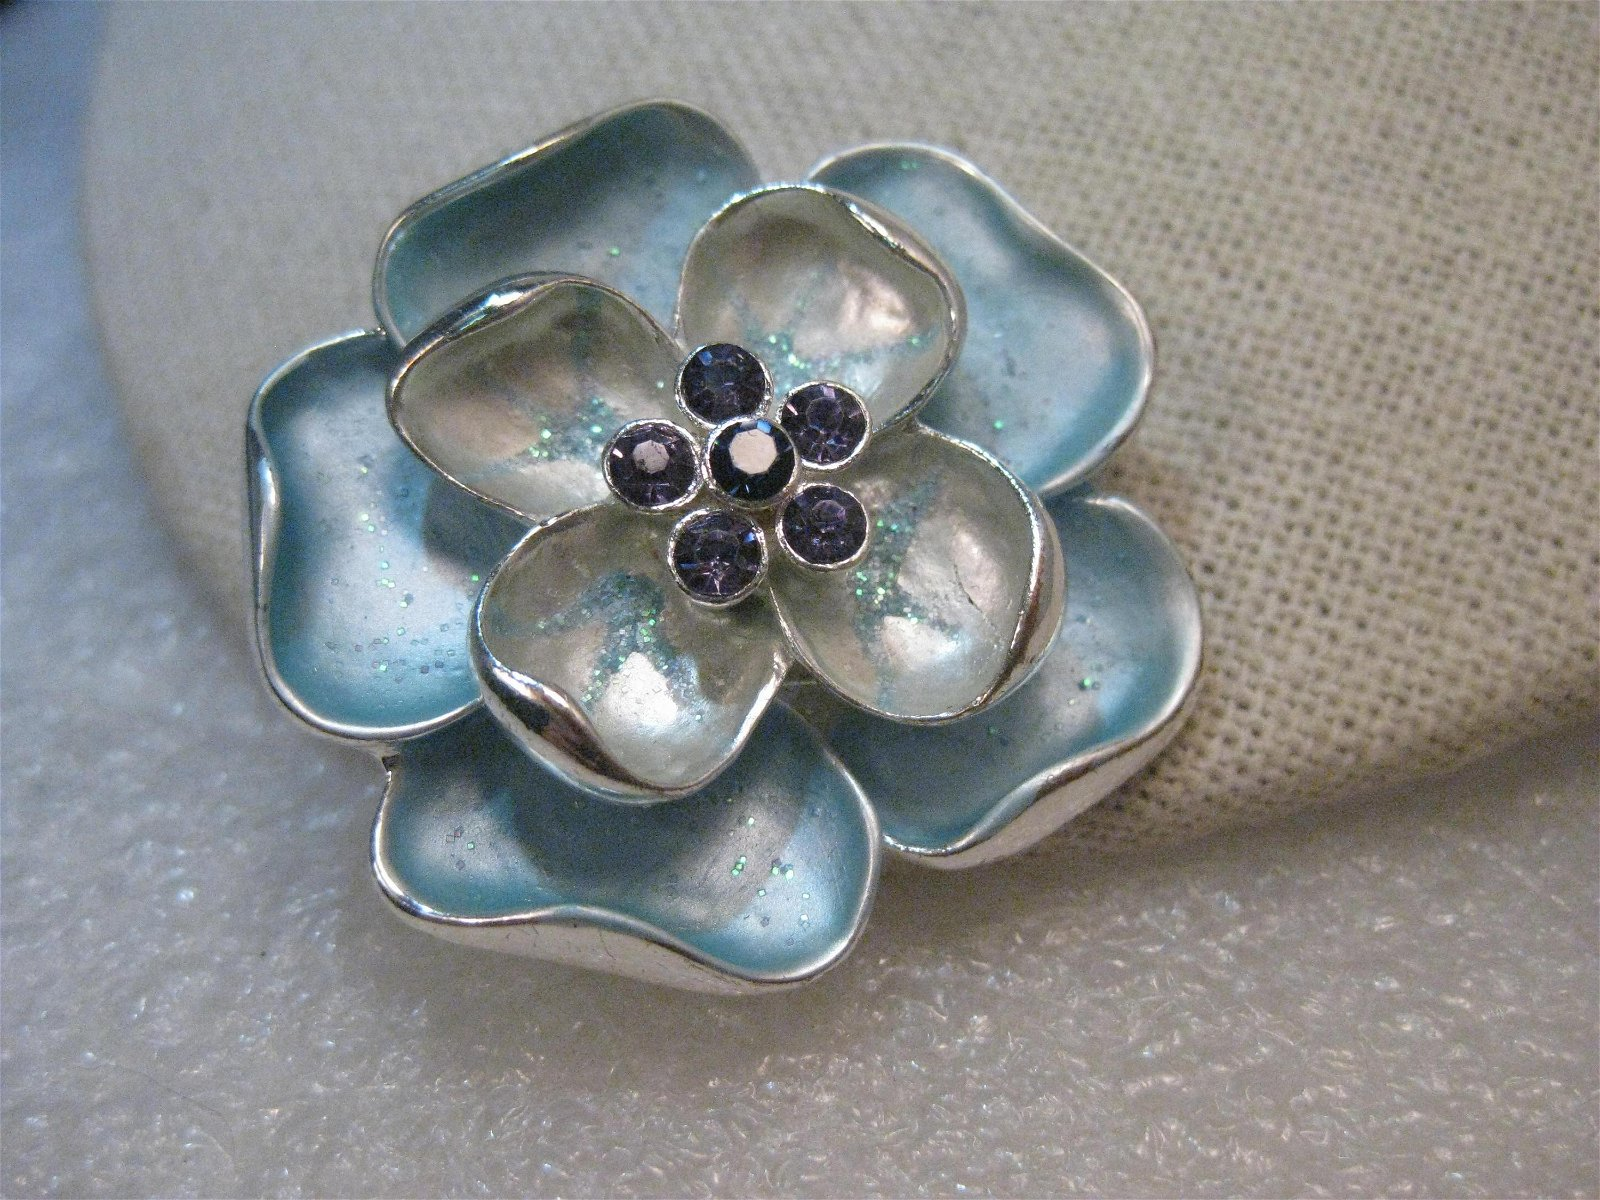 Vintage Blue Enameled Dogwood Brooch, Layered, Purple